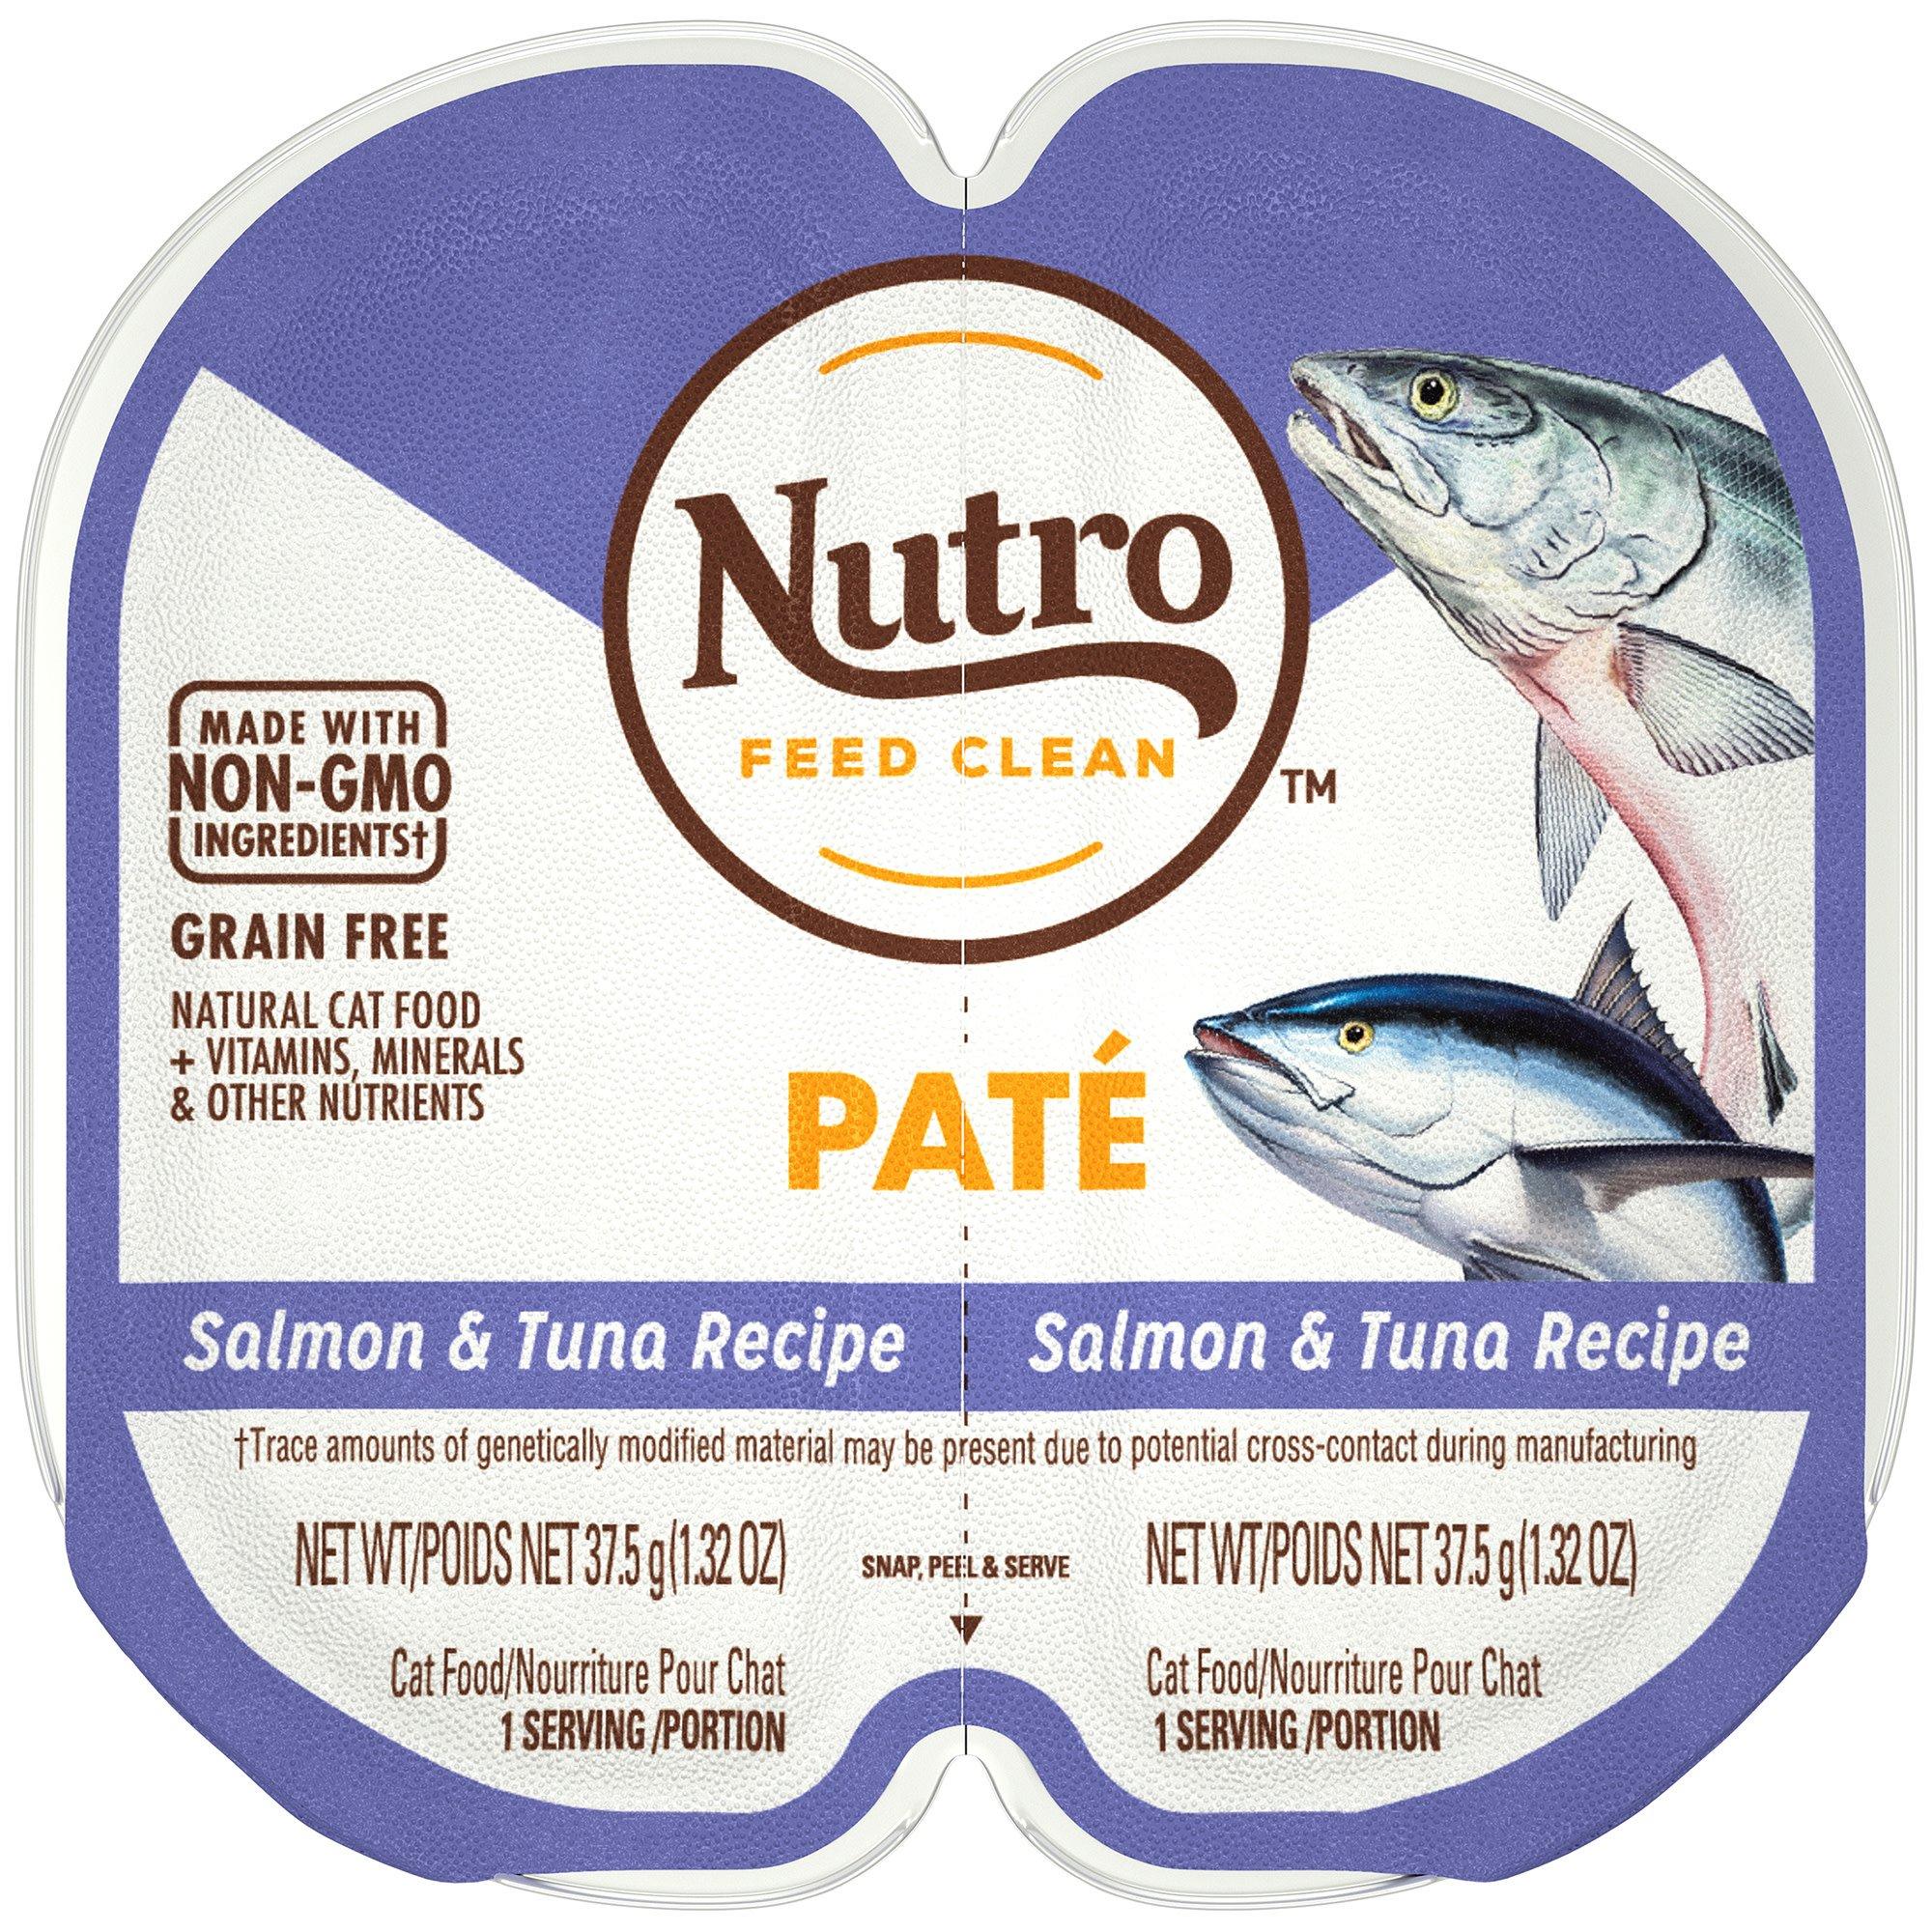 Nutro Perfect Portions Cat Food Petco